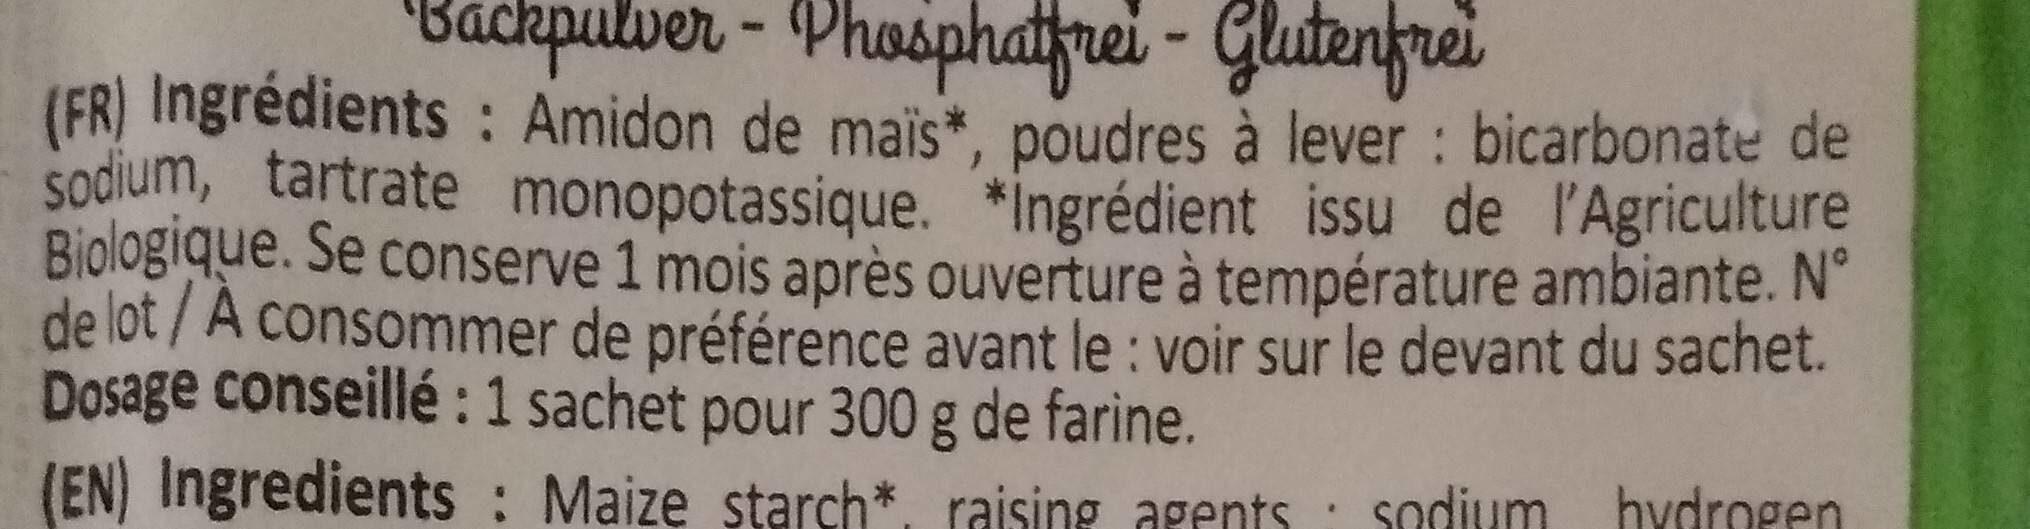 Poudre à Lever - Valori nutrizionali - fr